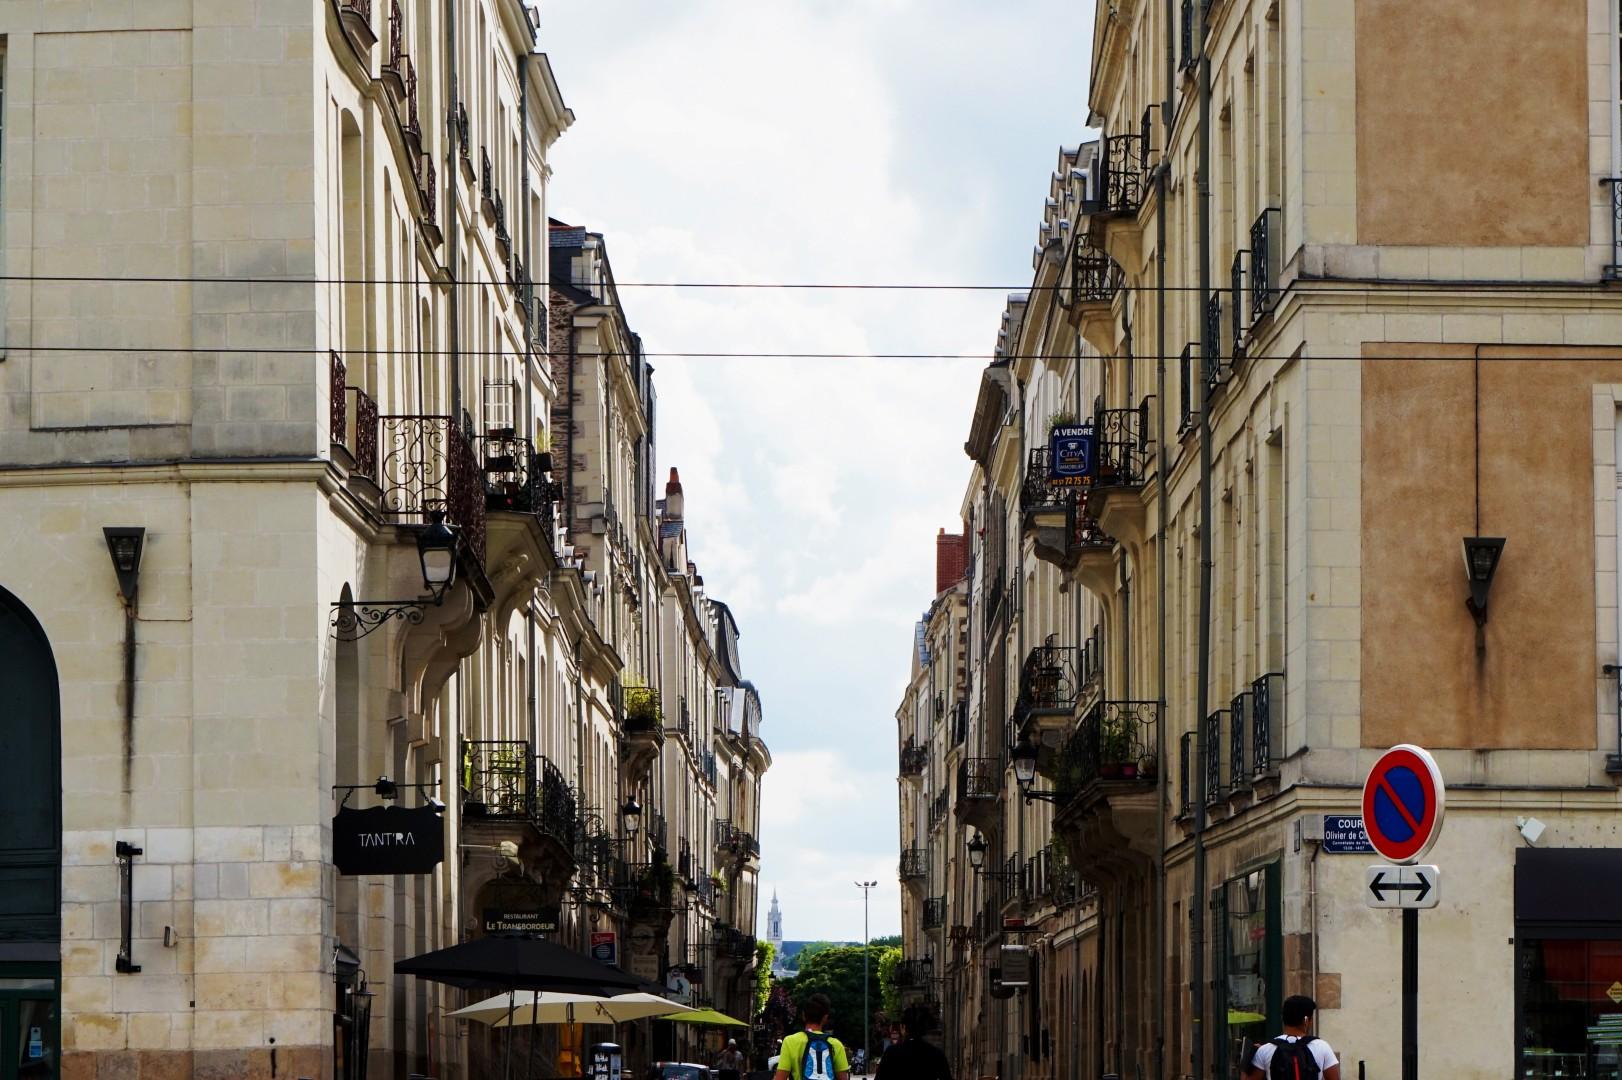 Un weekend à Nantes - Ile Feydeau